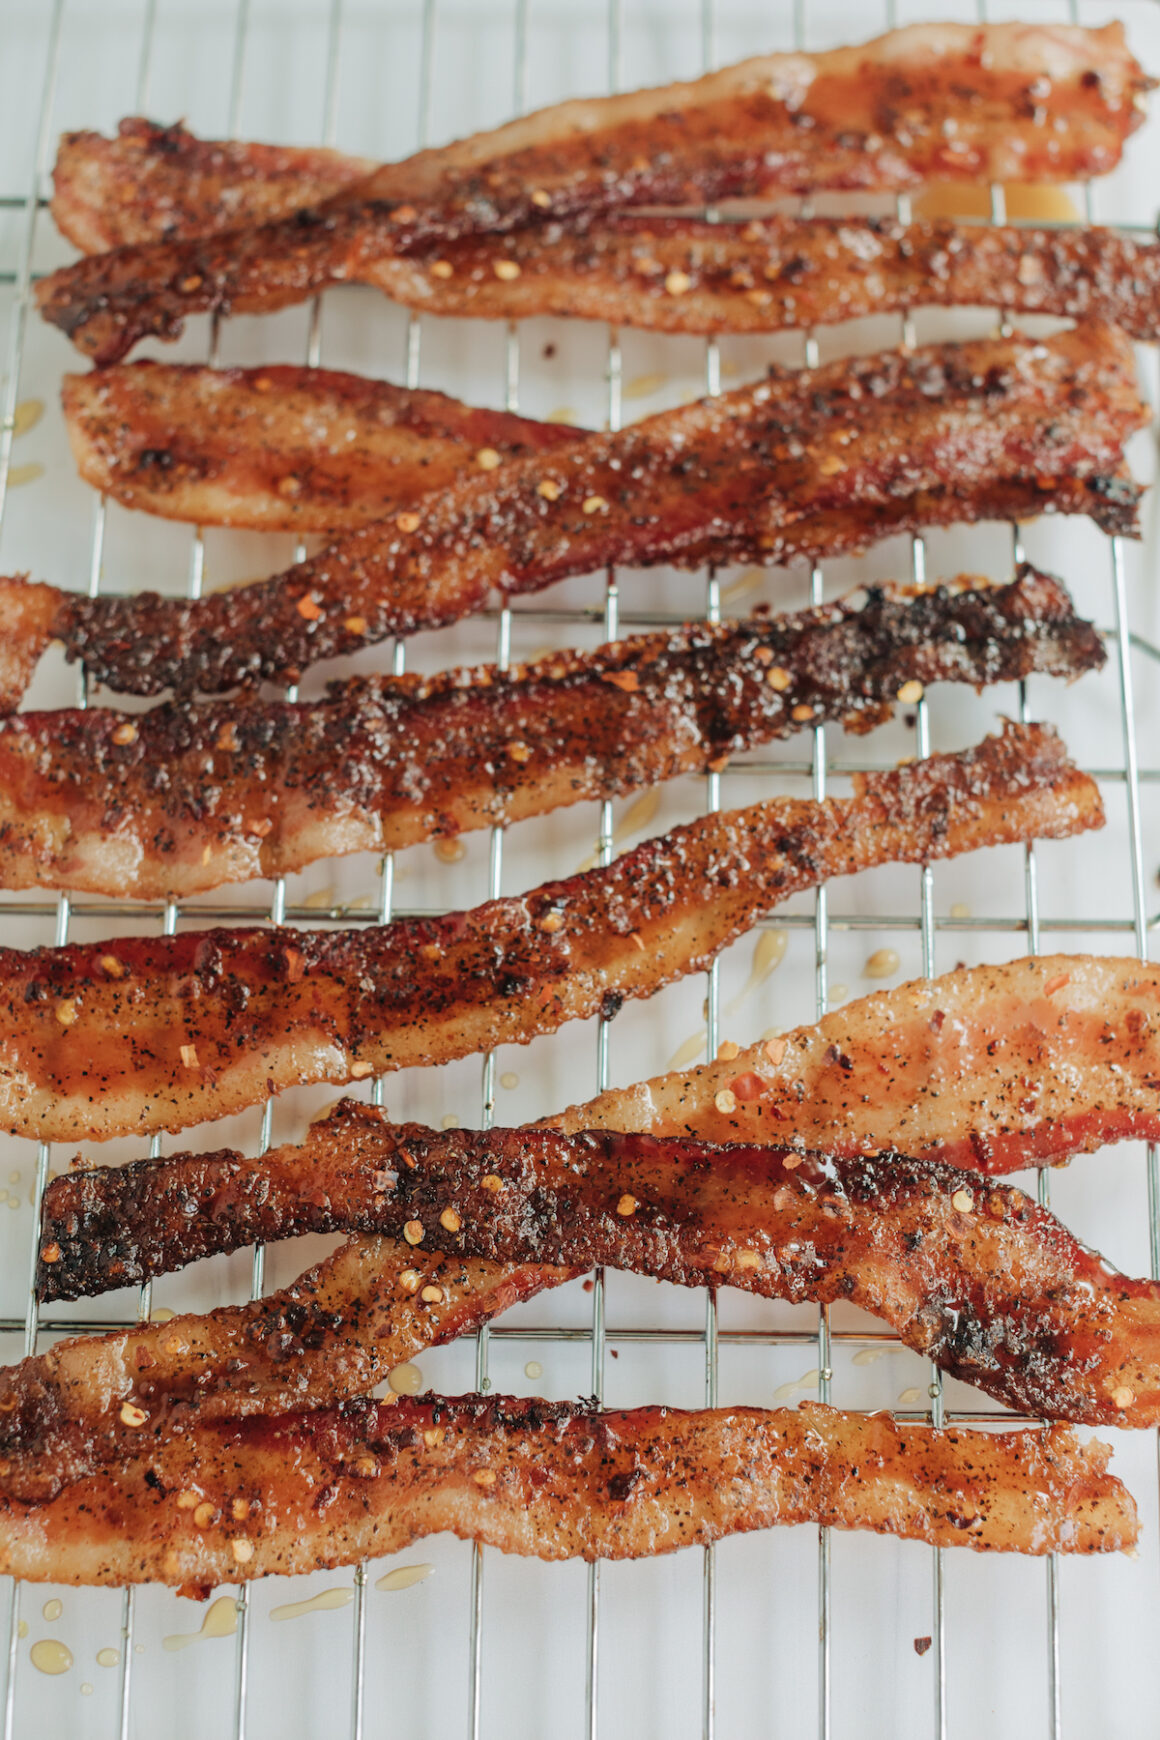 Million Dollar Bacon on a baking rack